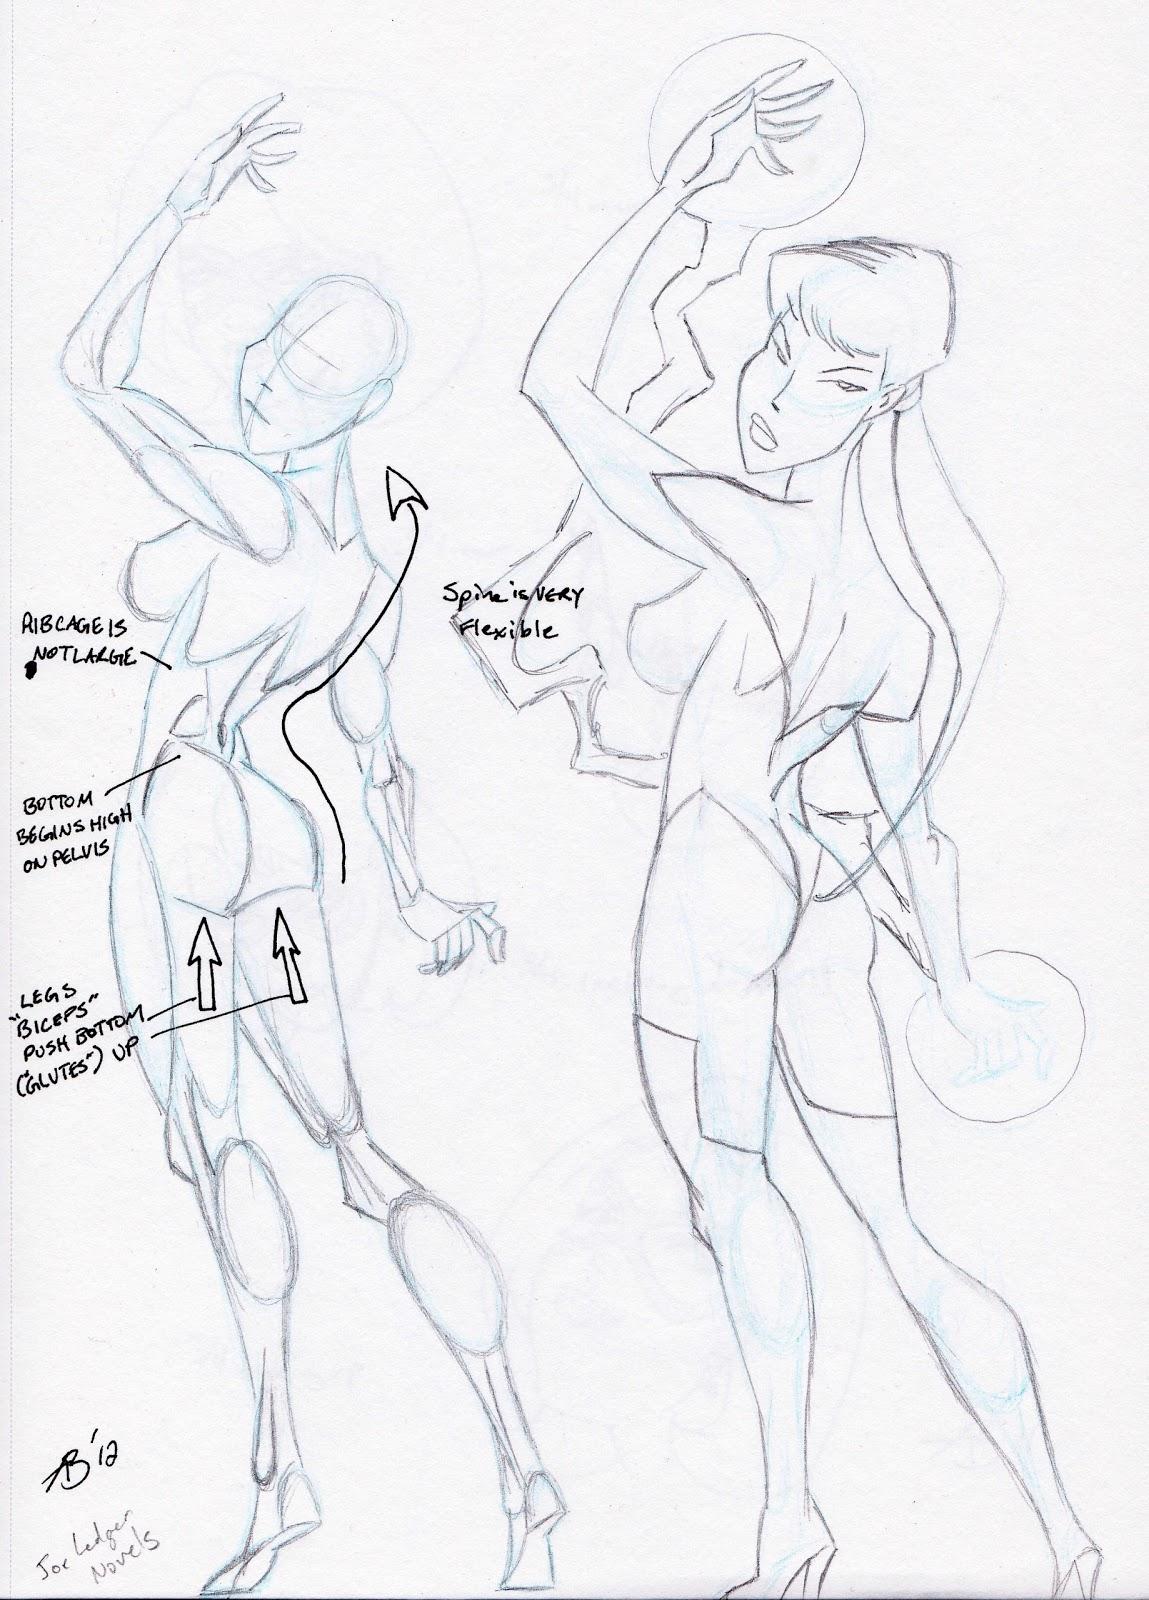 Anthony Bachman Illustrator: 182 - Sweet sweet backside - female ...